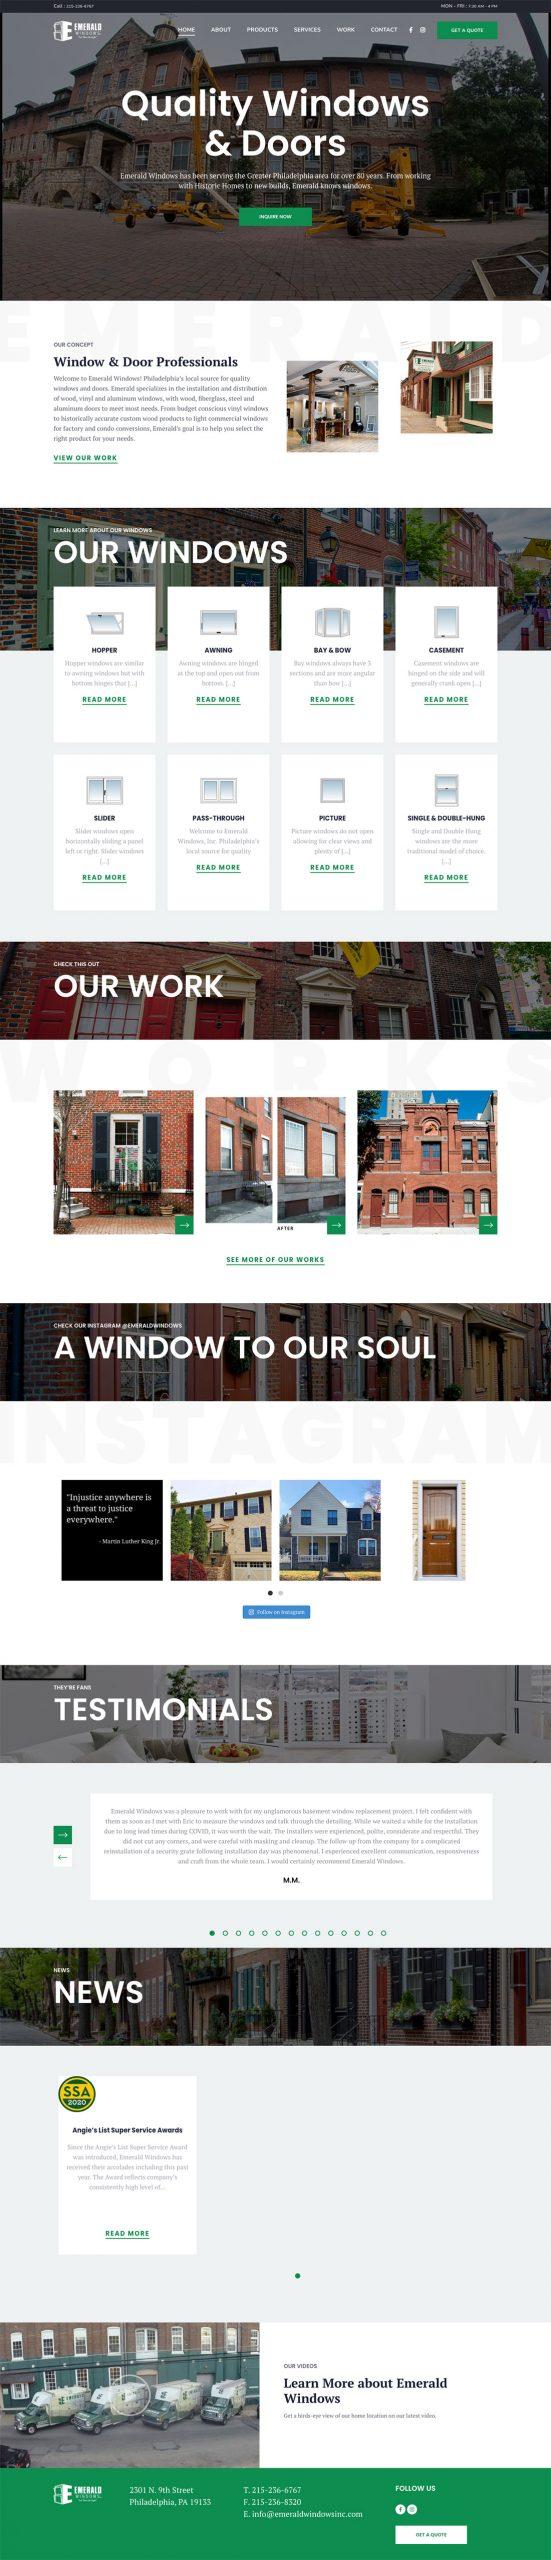 emerald windows website